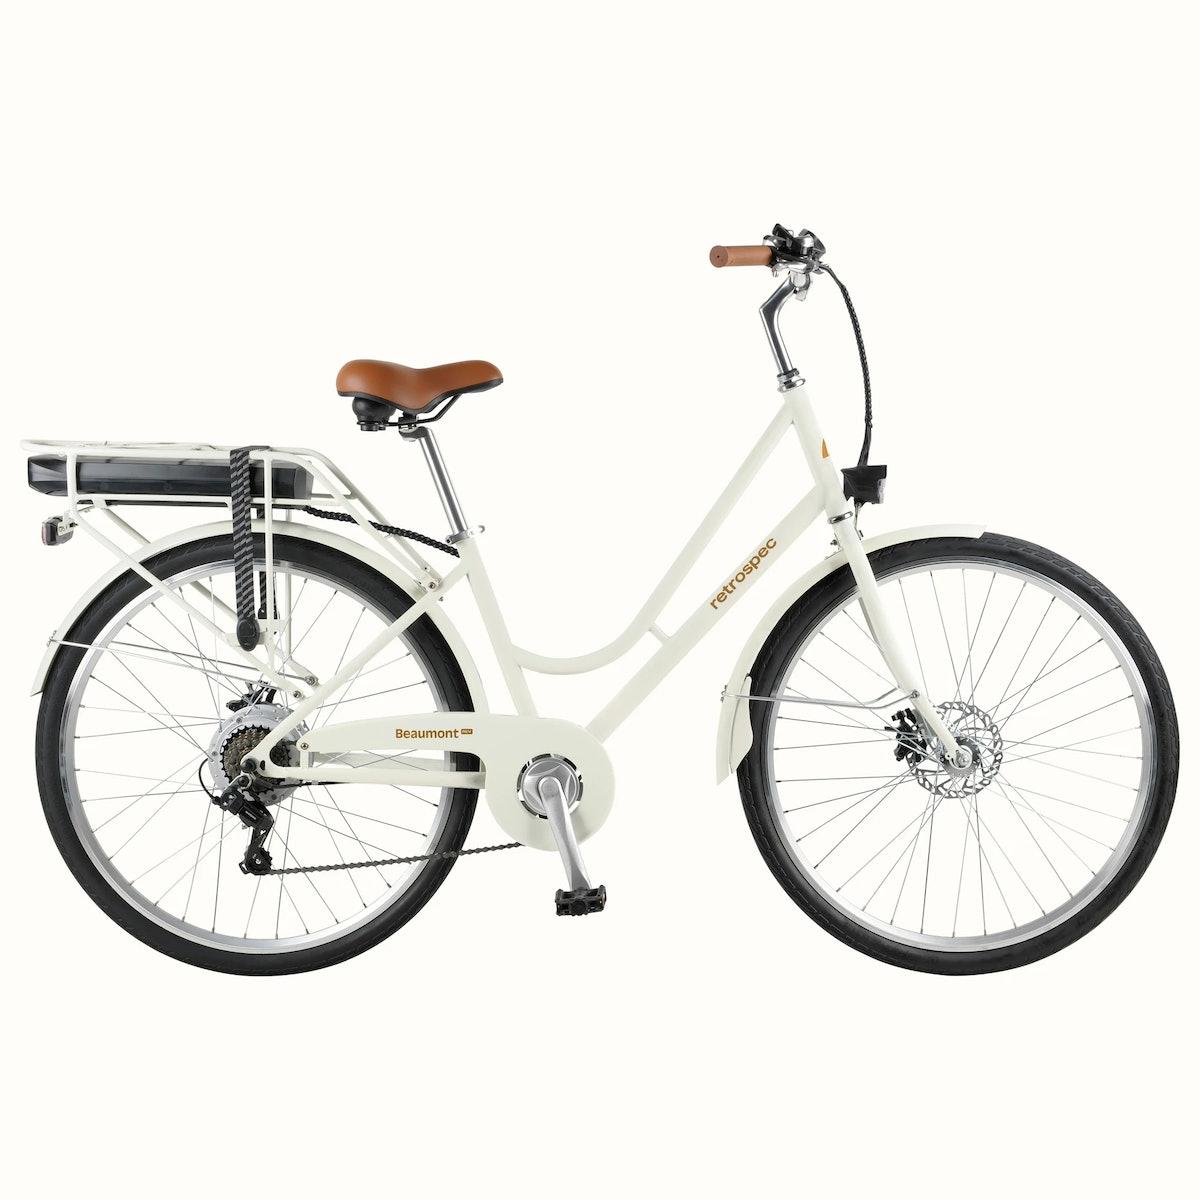 Beaumont Rev City Electric Bike - Step Through